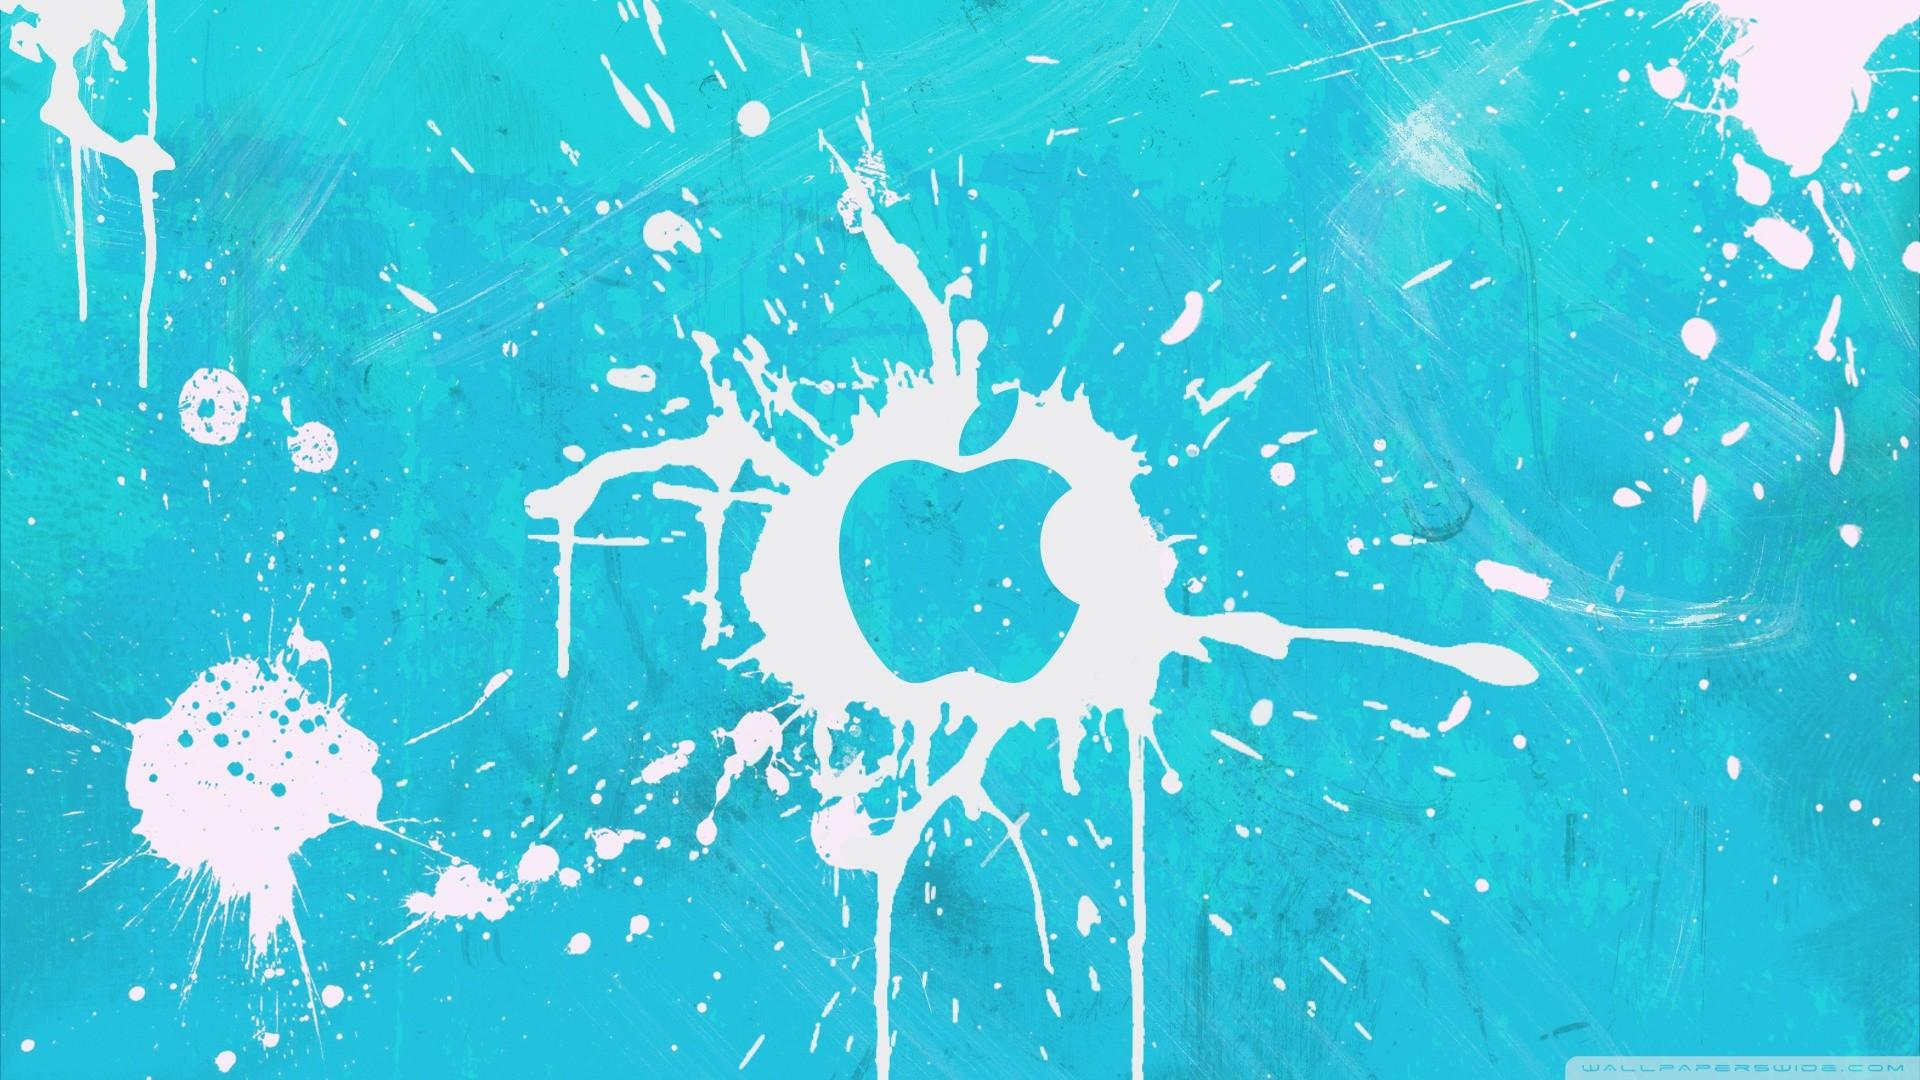 Splash Aqua Hd Desktop Wallpaper Widescreen High Definition .